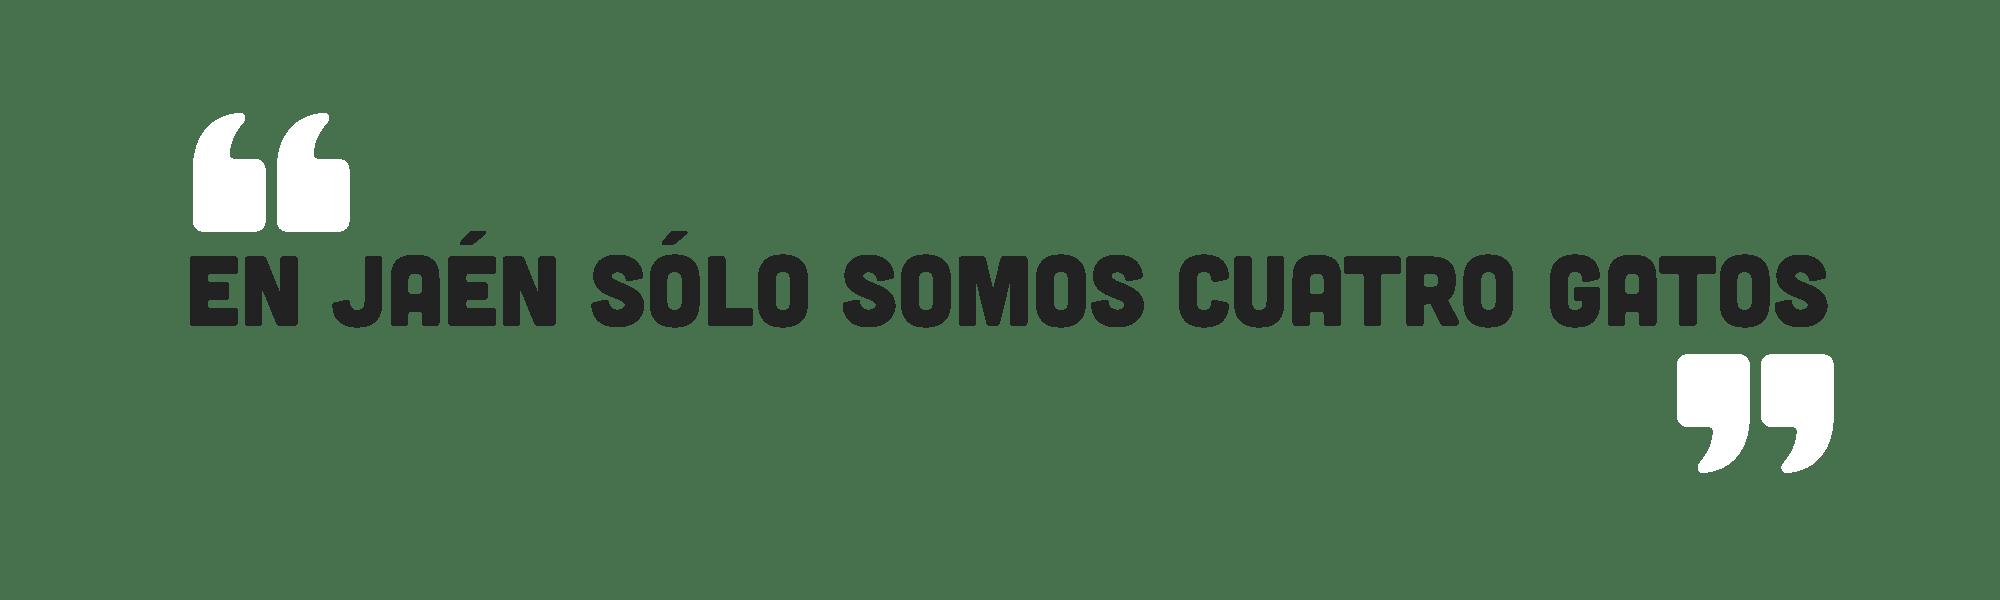 Home_Frase_Cuatro_Gatos_Coworking_Jaen